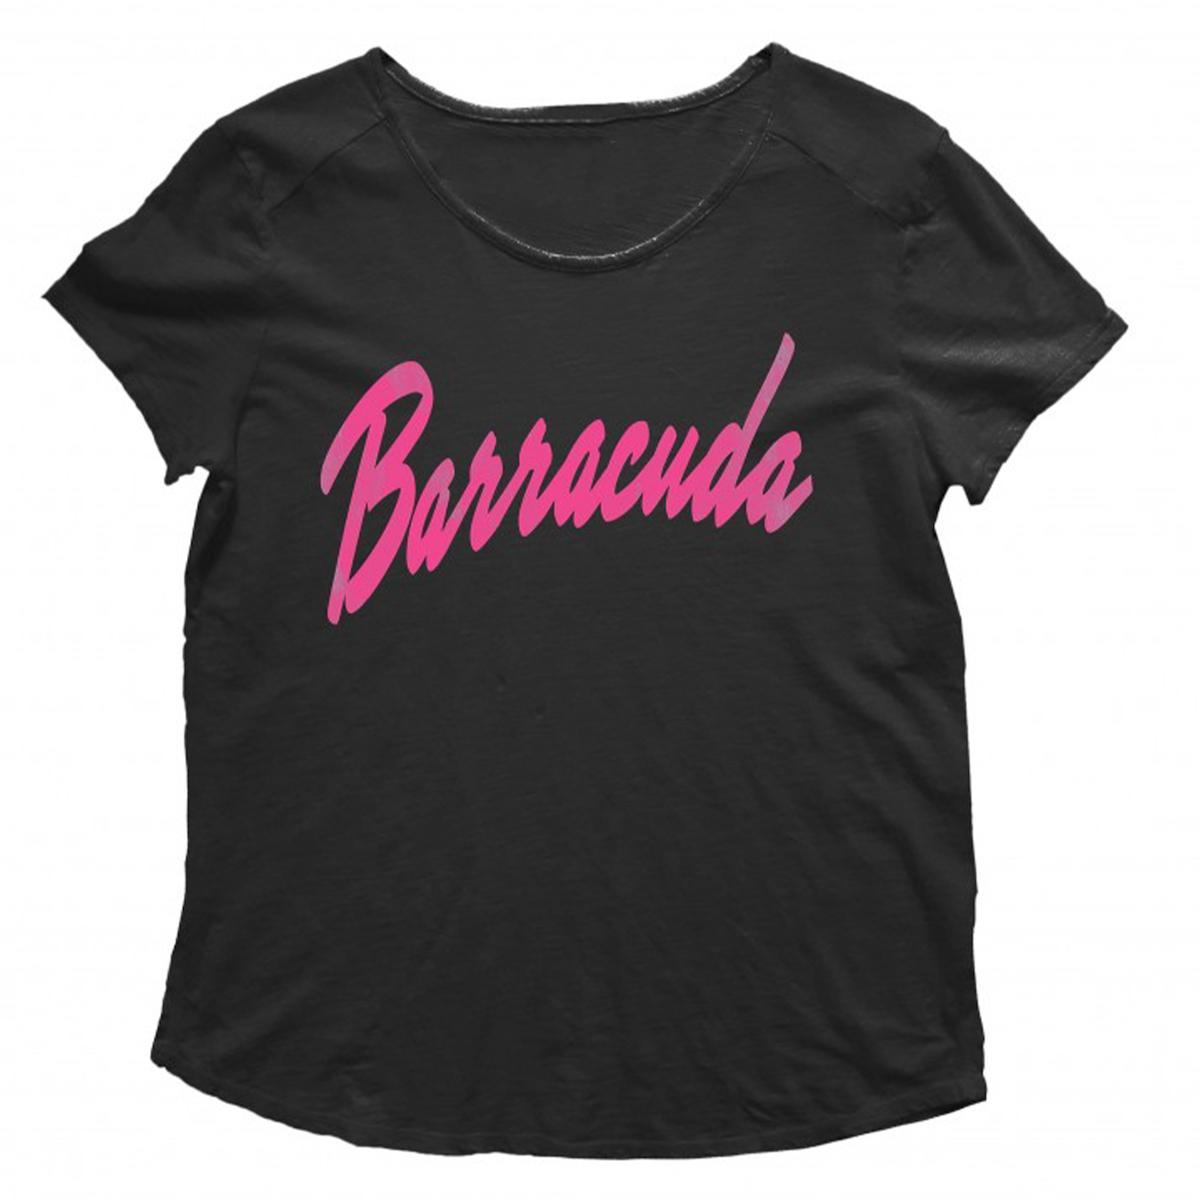 Barracuda Ladies T-Shirt